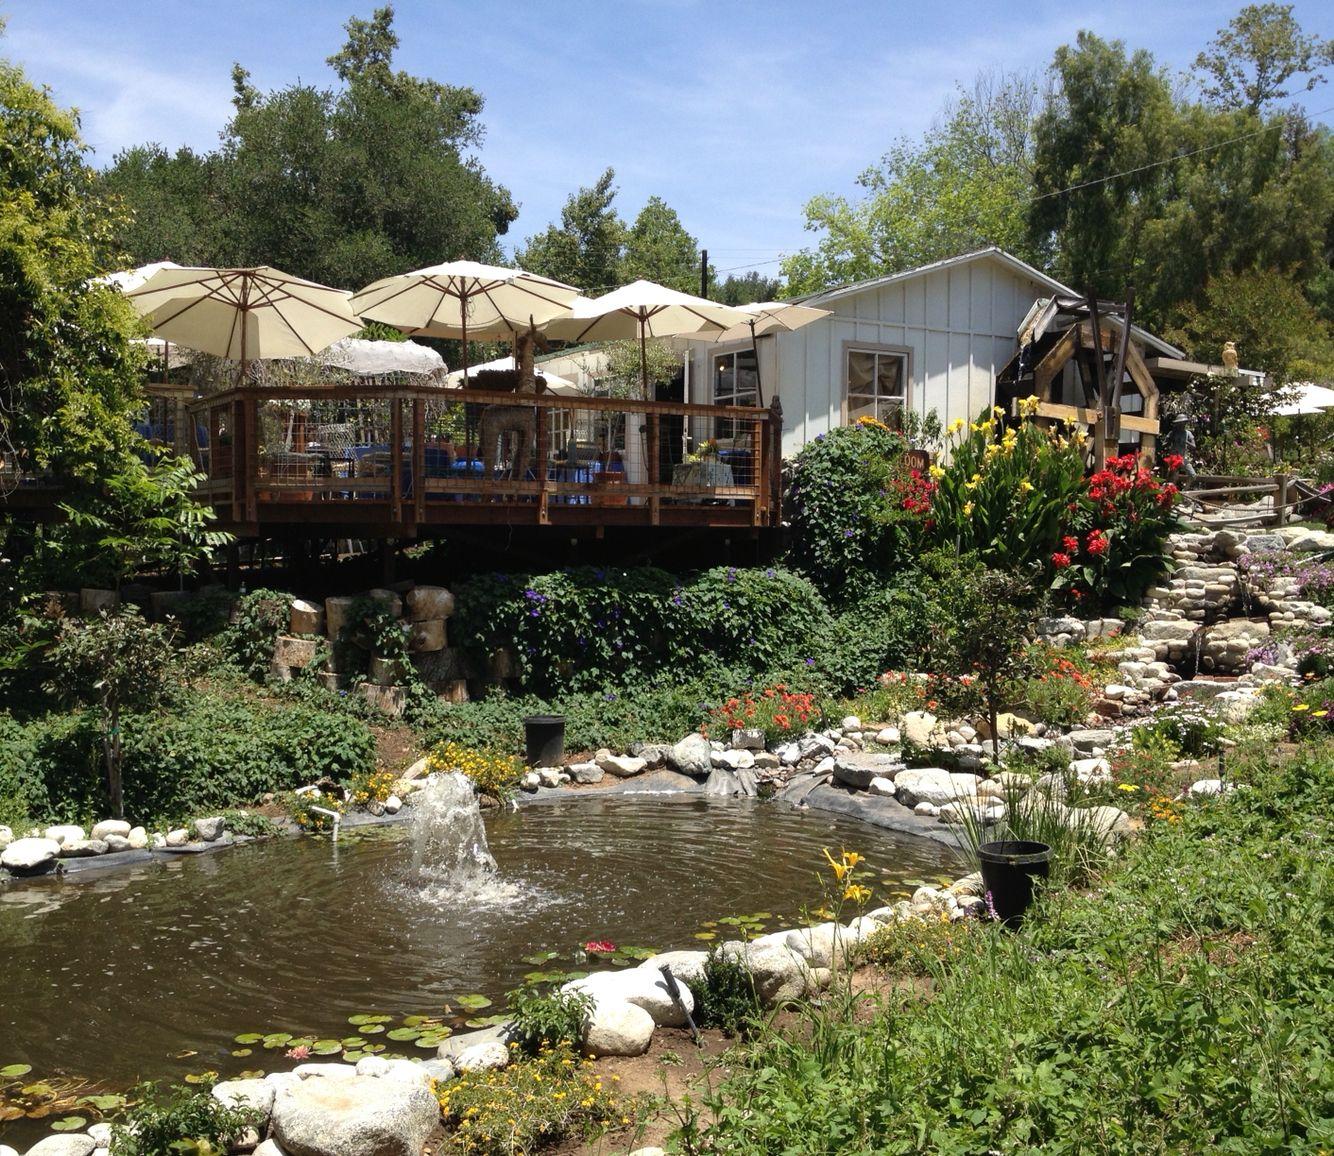 760556d00c7b2b5446f7b4e8c7cabbc5 - Myrtle Creek Botanical Gardens & Nursery Fallbrook Ca